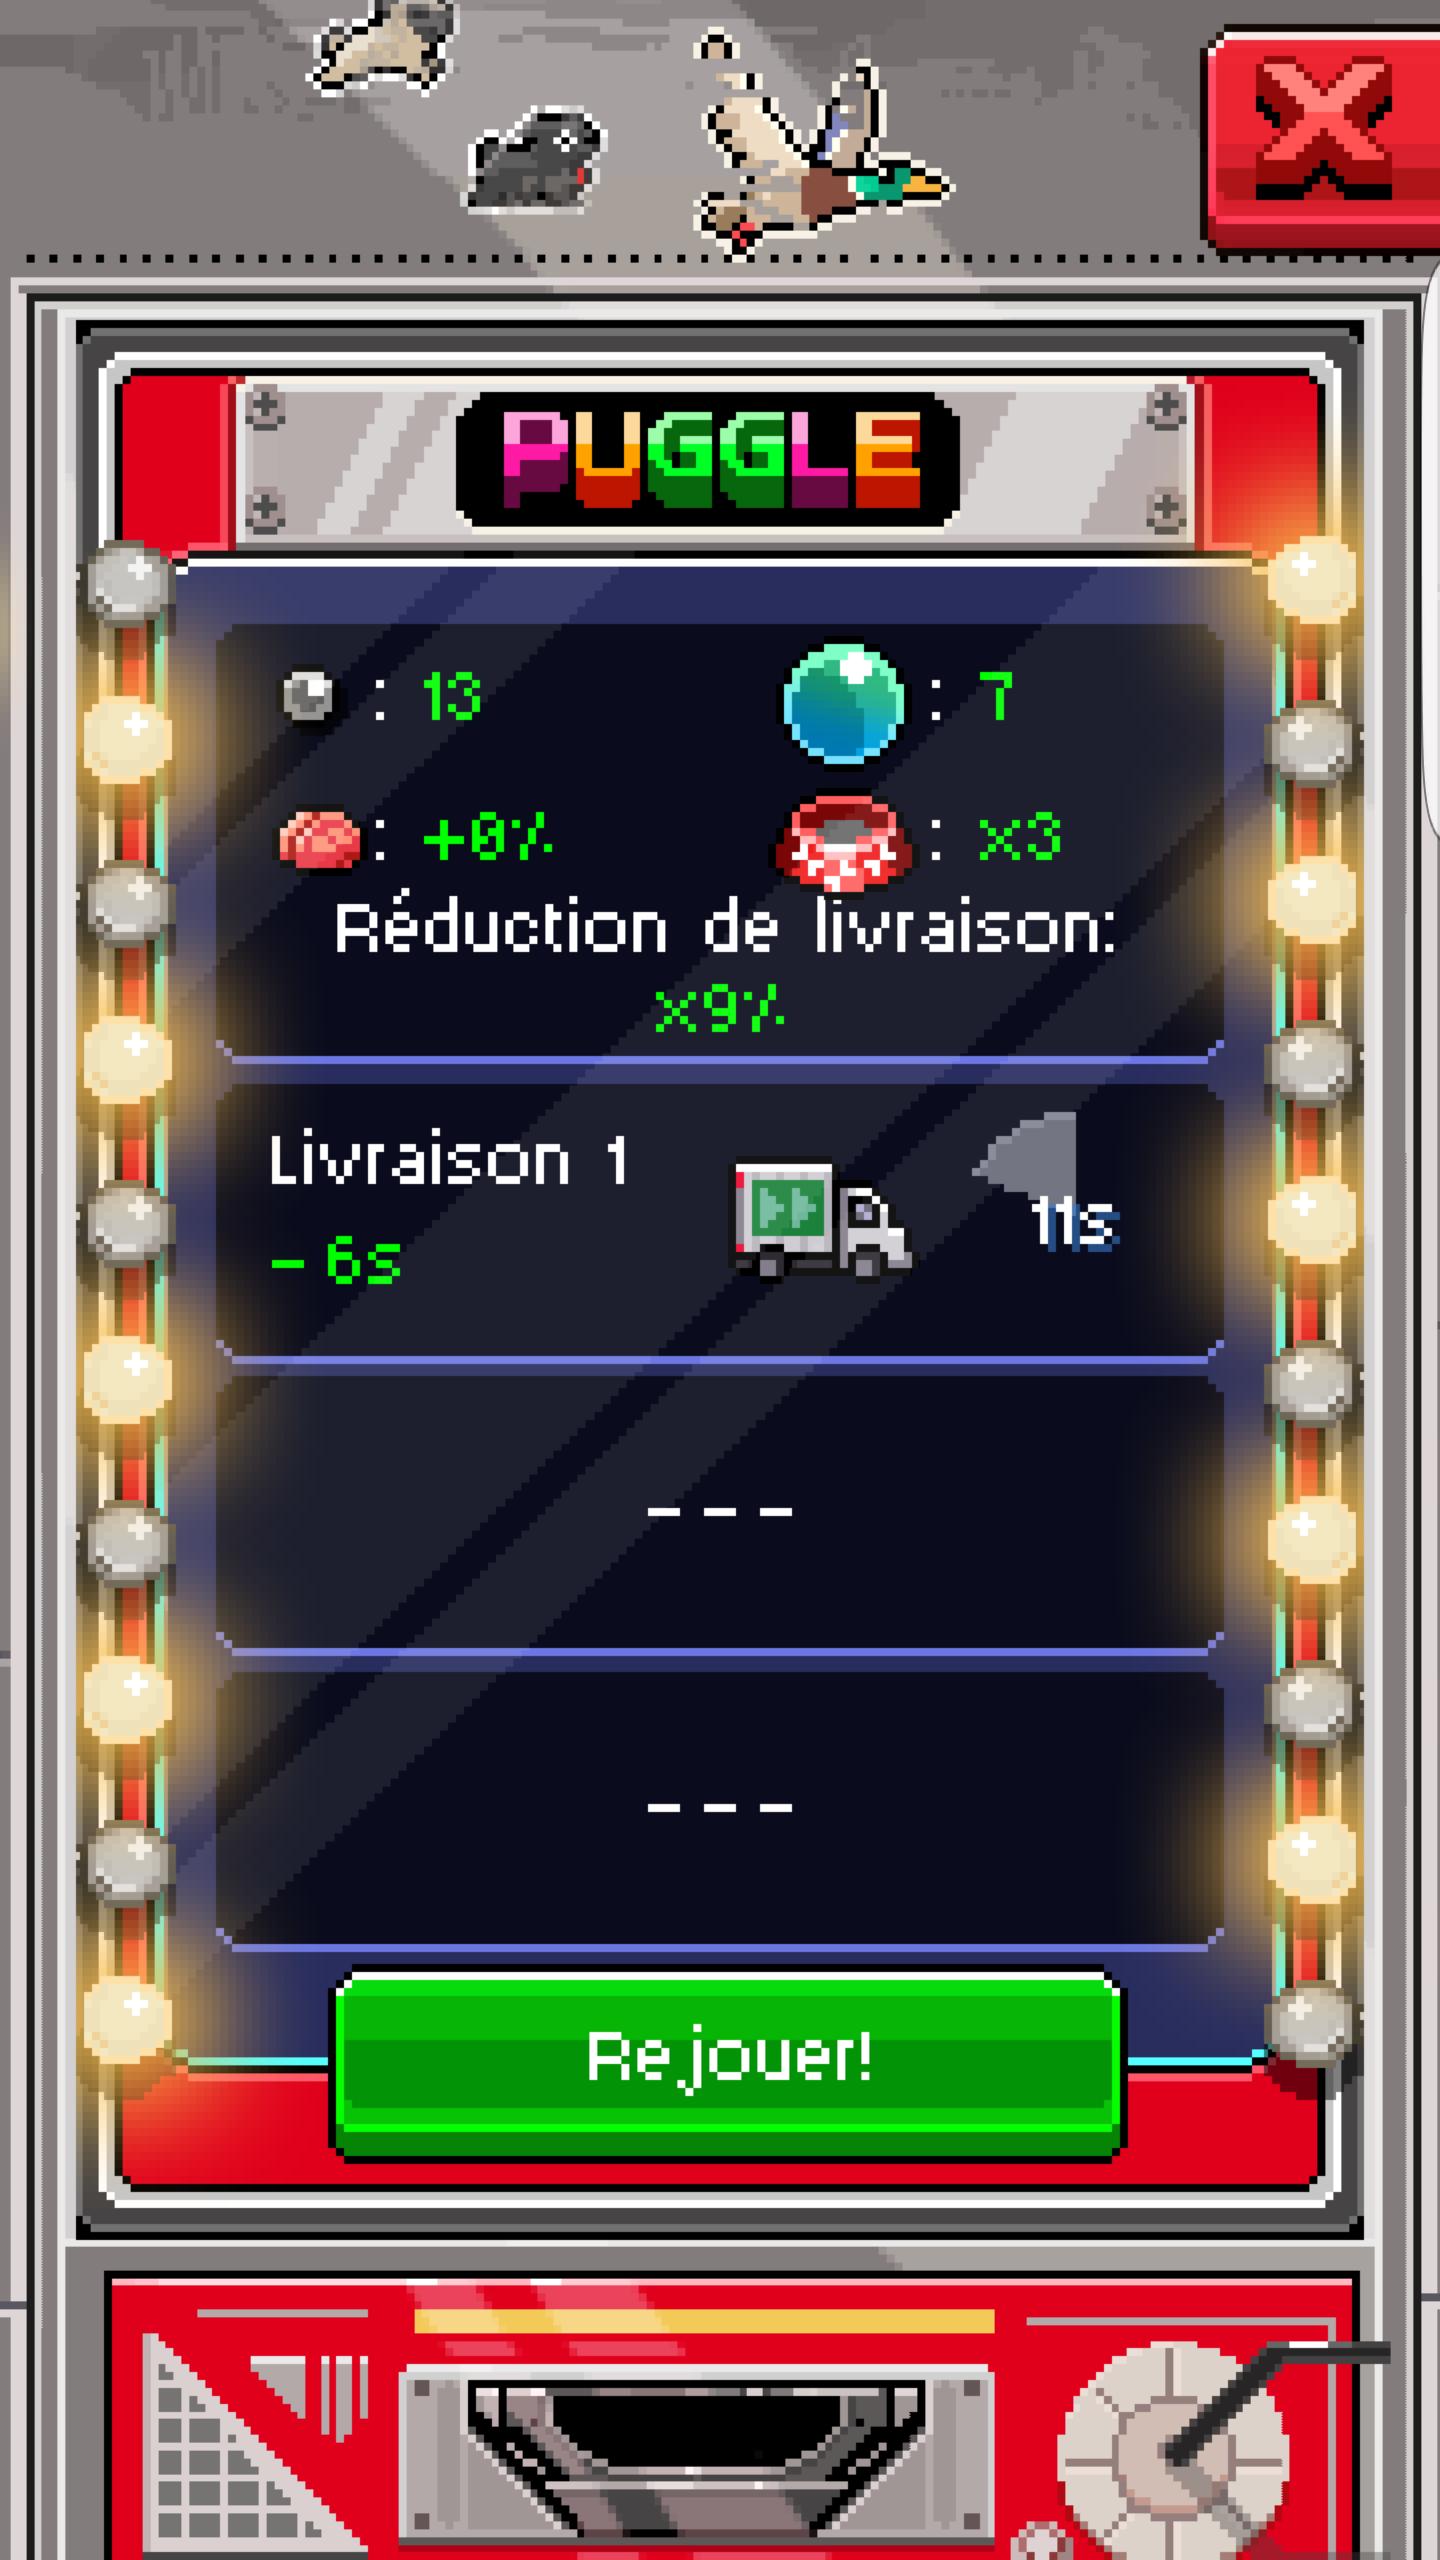 pewdiepies-tuber-simulator-android-6